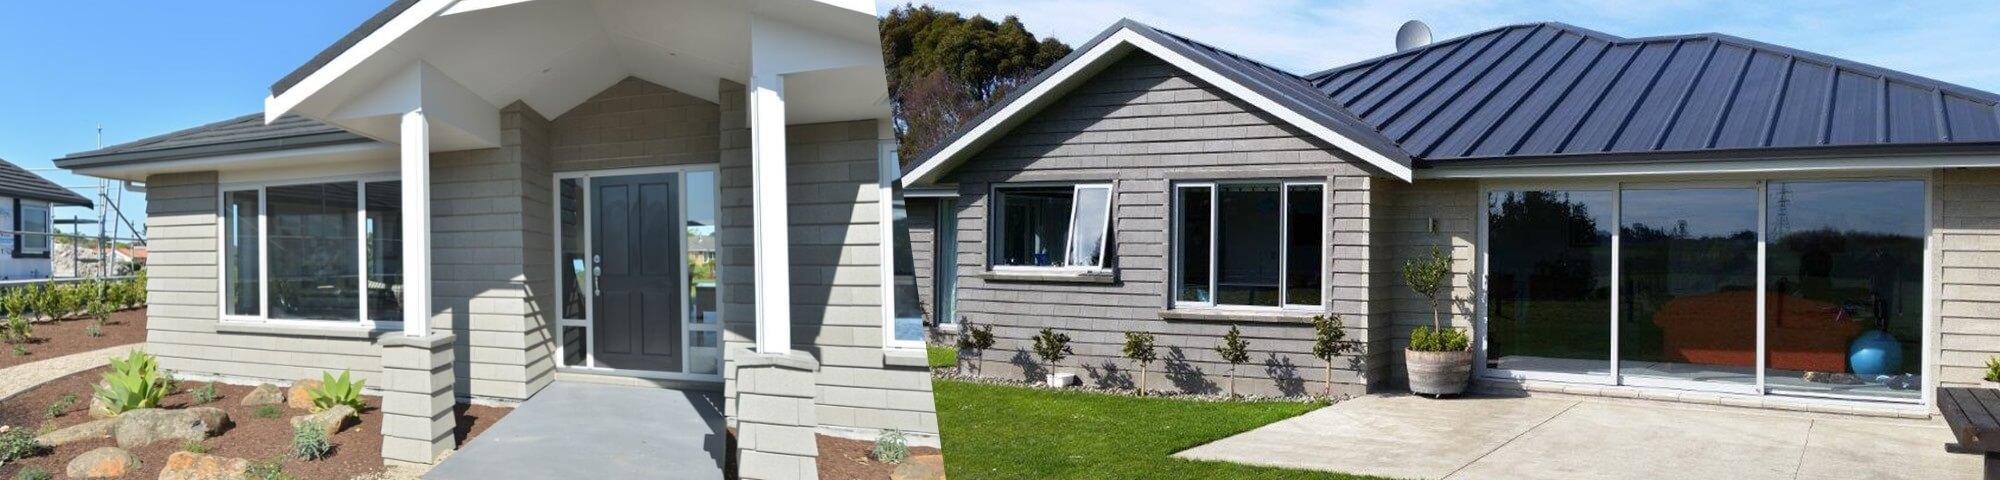 House Cladding Nz House Cladding Nz  Brick Veneer Manufacturers Otago